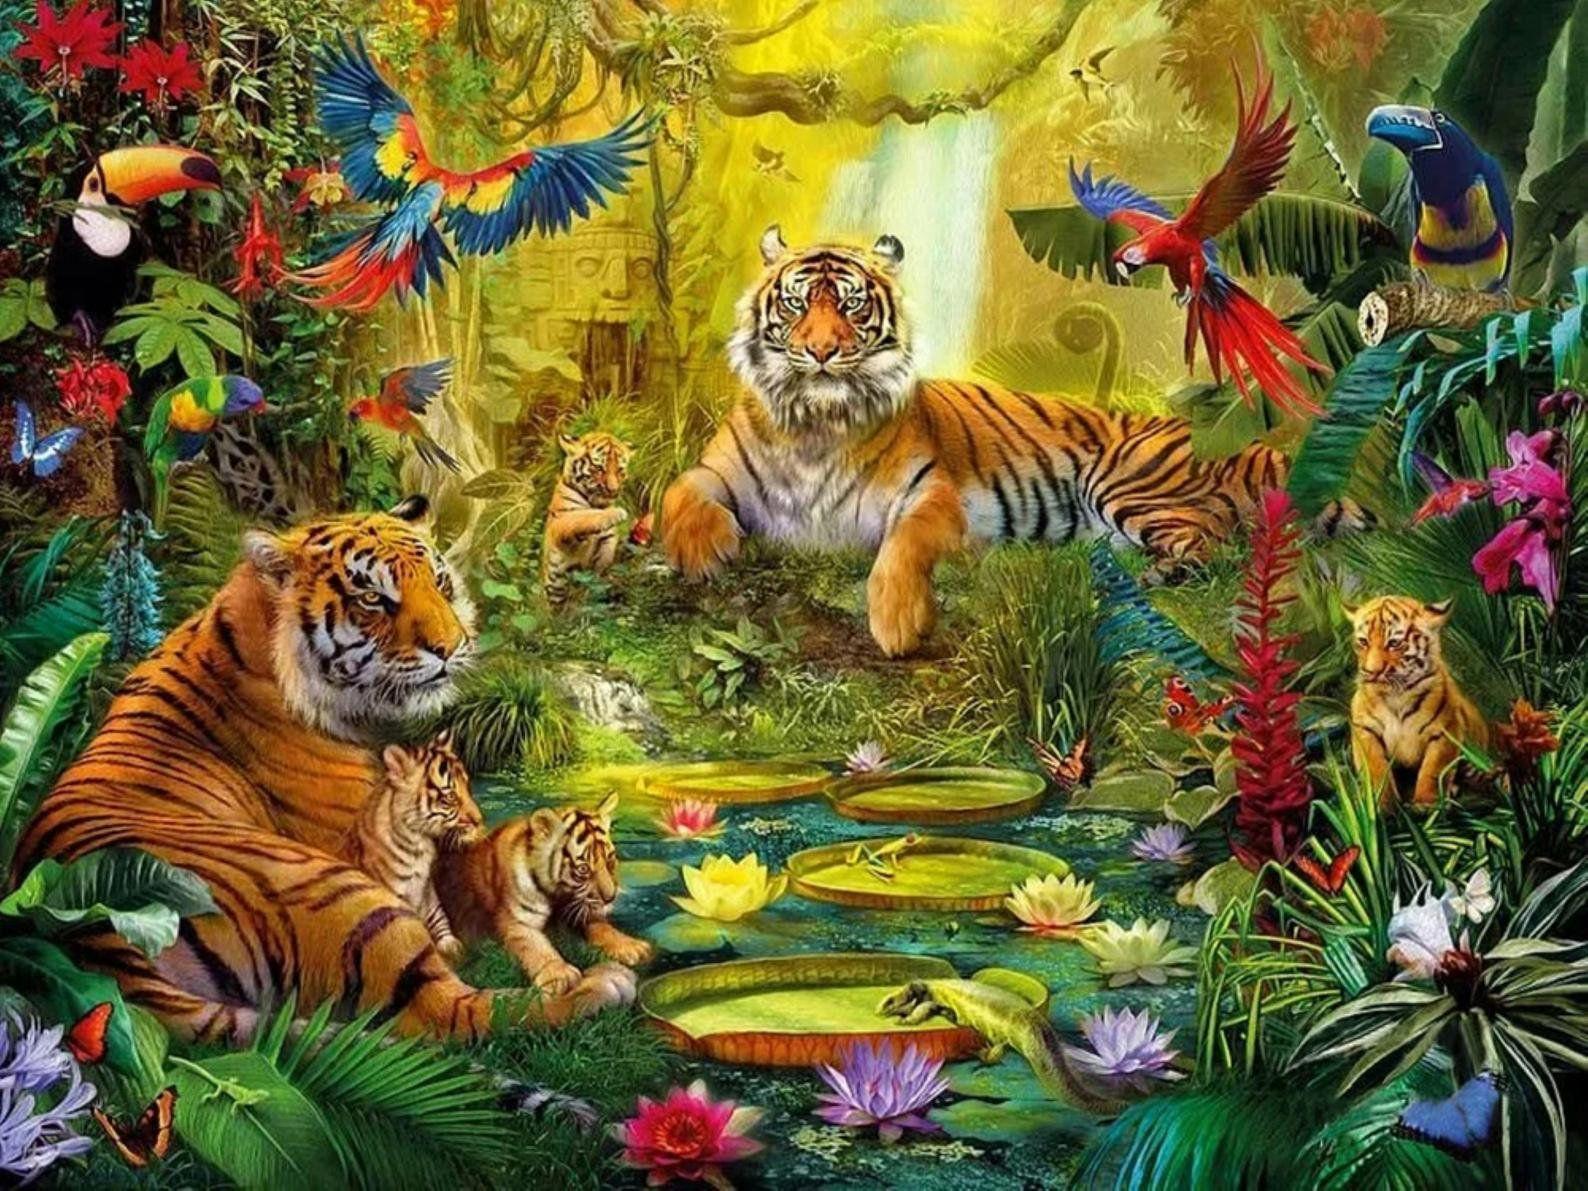 Happy Tiger Home Gift Decor 5d Diy Diamond Painting Kit Full Square Round Diamond Embroidery Mosaic Wall Decor Rhinestone Cross Stitch In 2021 Jungle Art Animal Wallpaper Painting